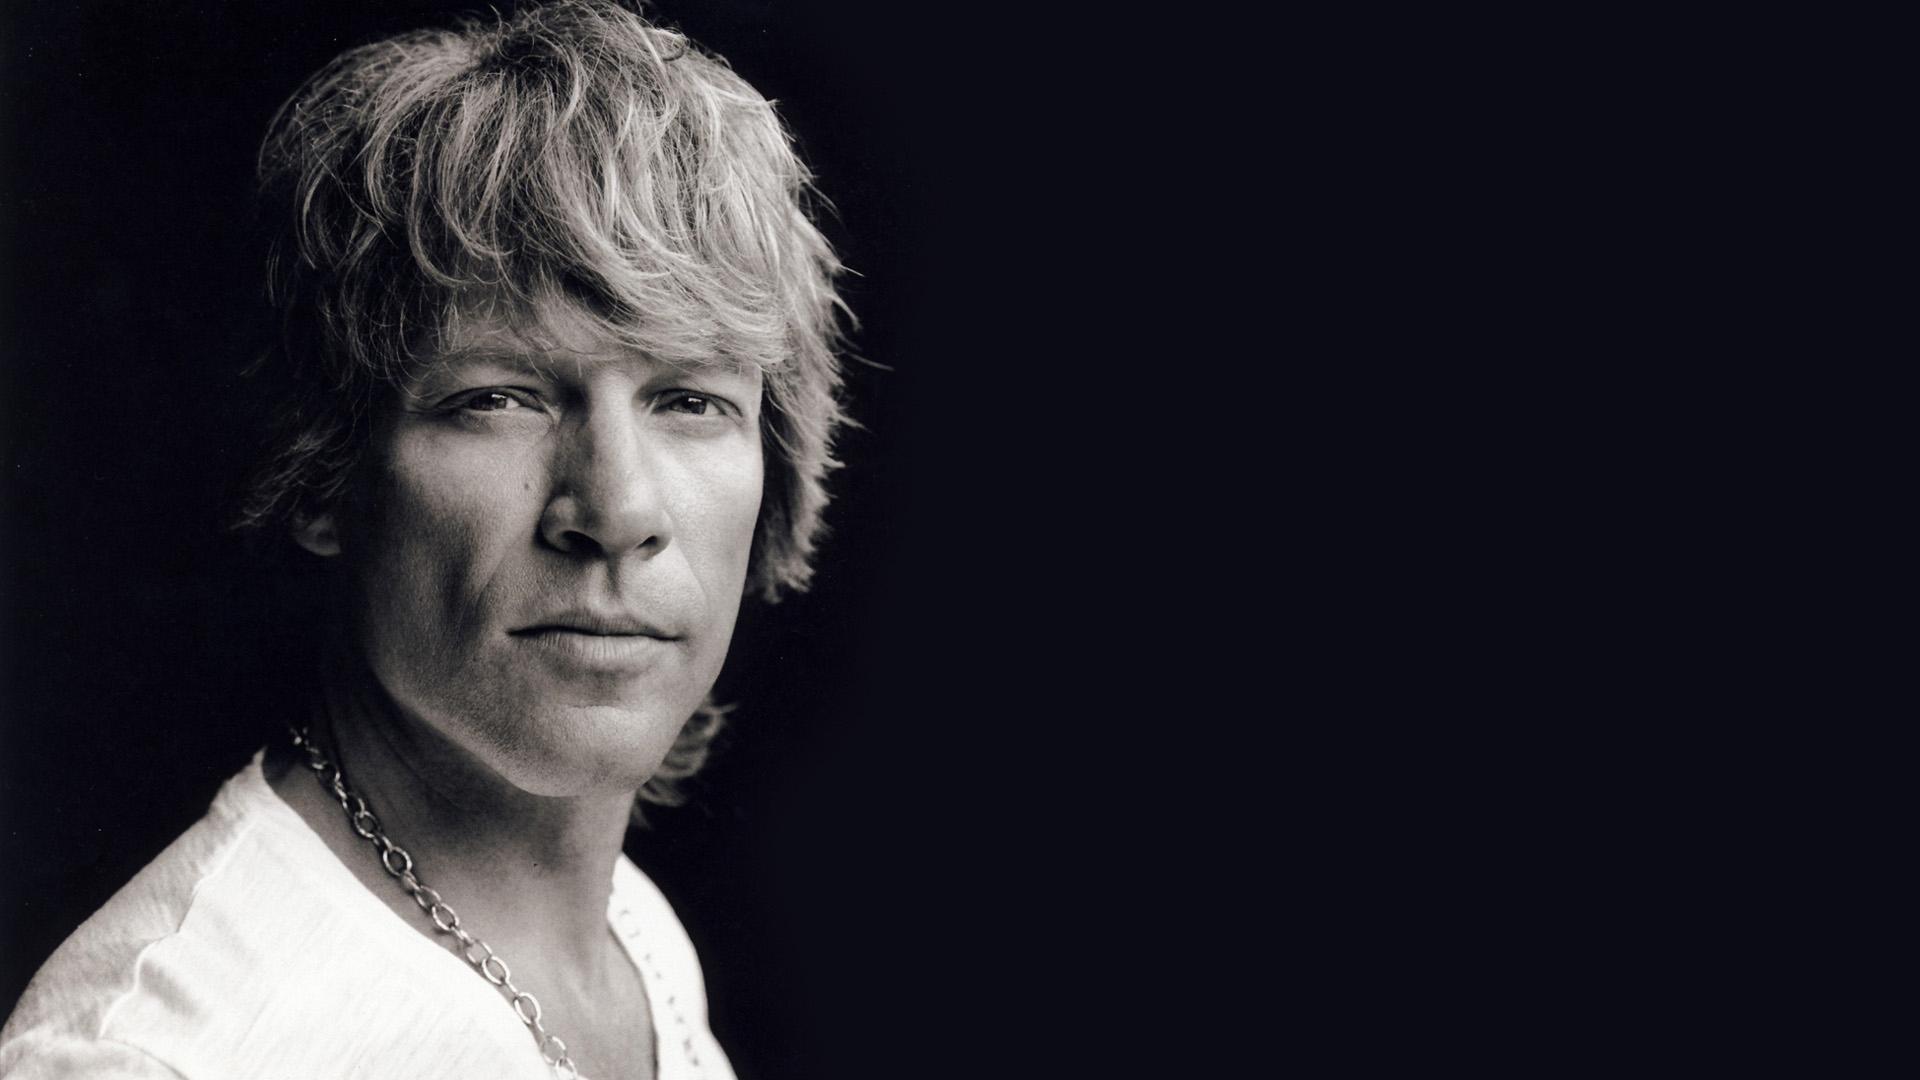 Jon Bon Jovi For Desktop